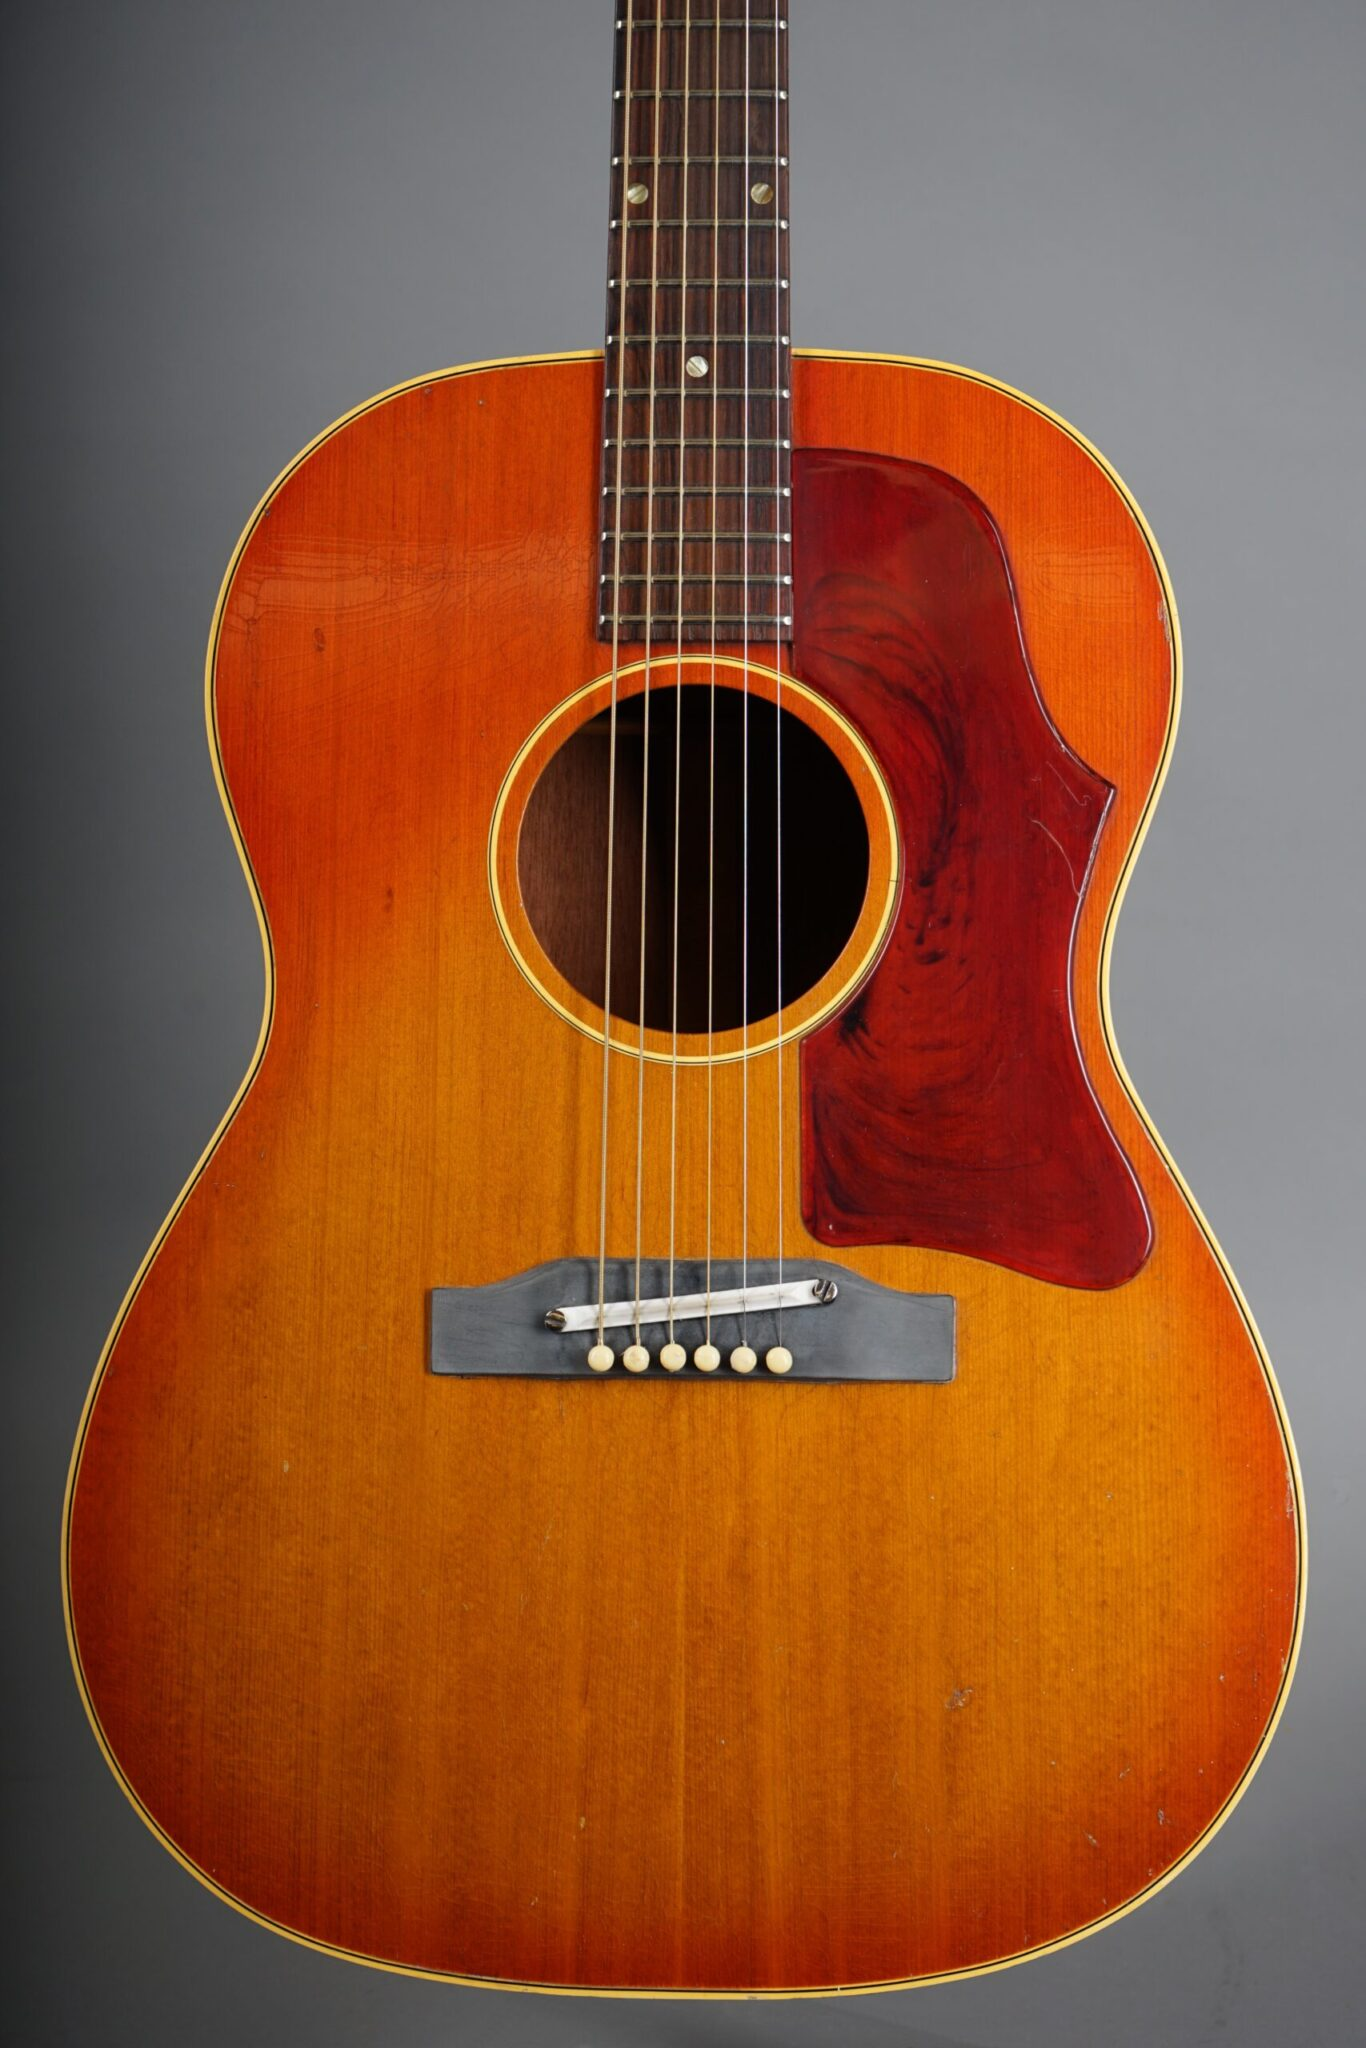 https://guitarpoint.de/app/uploads/products/1965-gibson-b-25-sunburst-3/1965-Gibson-B-25-Cherry-Sunburst-260713-2-scaled-1366x2048.jpg